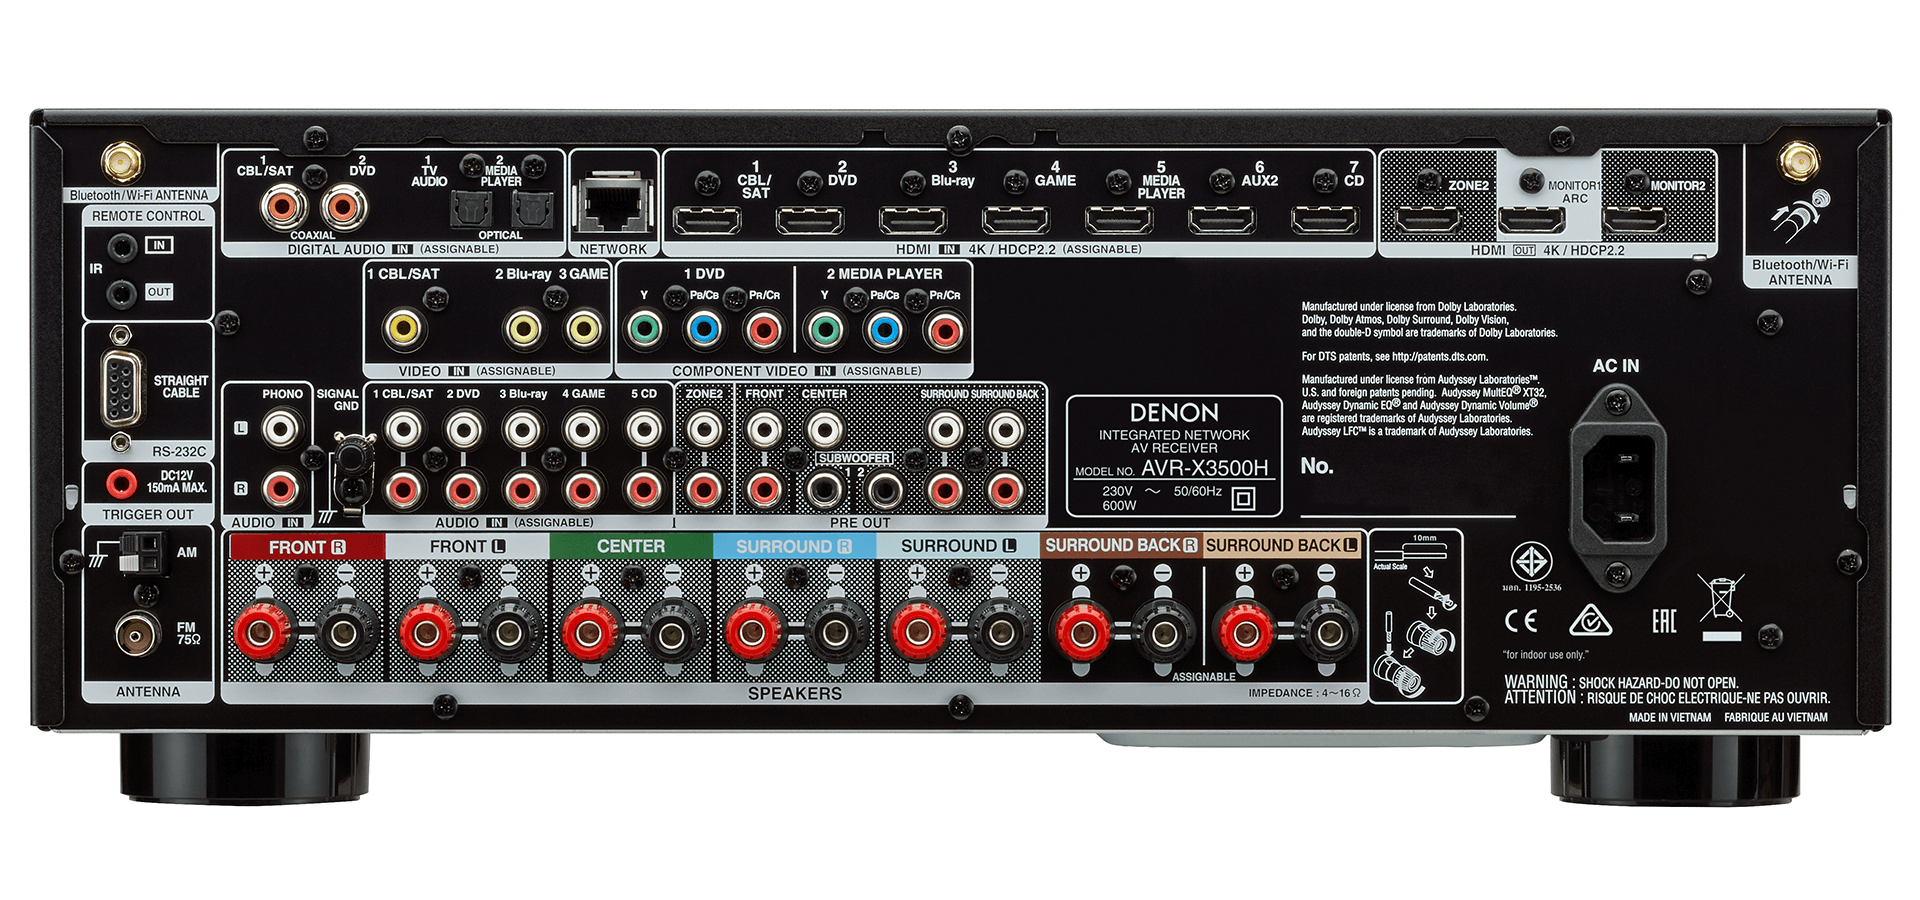 Denon AVR-X3500H AV Receiver 7 2 Channel HEOS Dolby Atmos DTS:X 4K HDCP 2 2  HDR Alexa